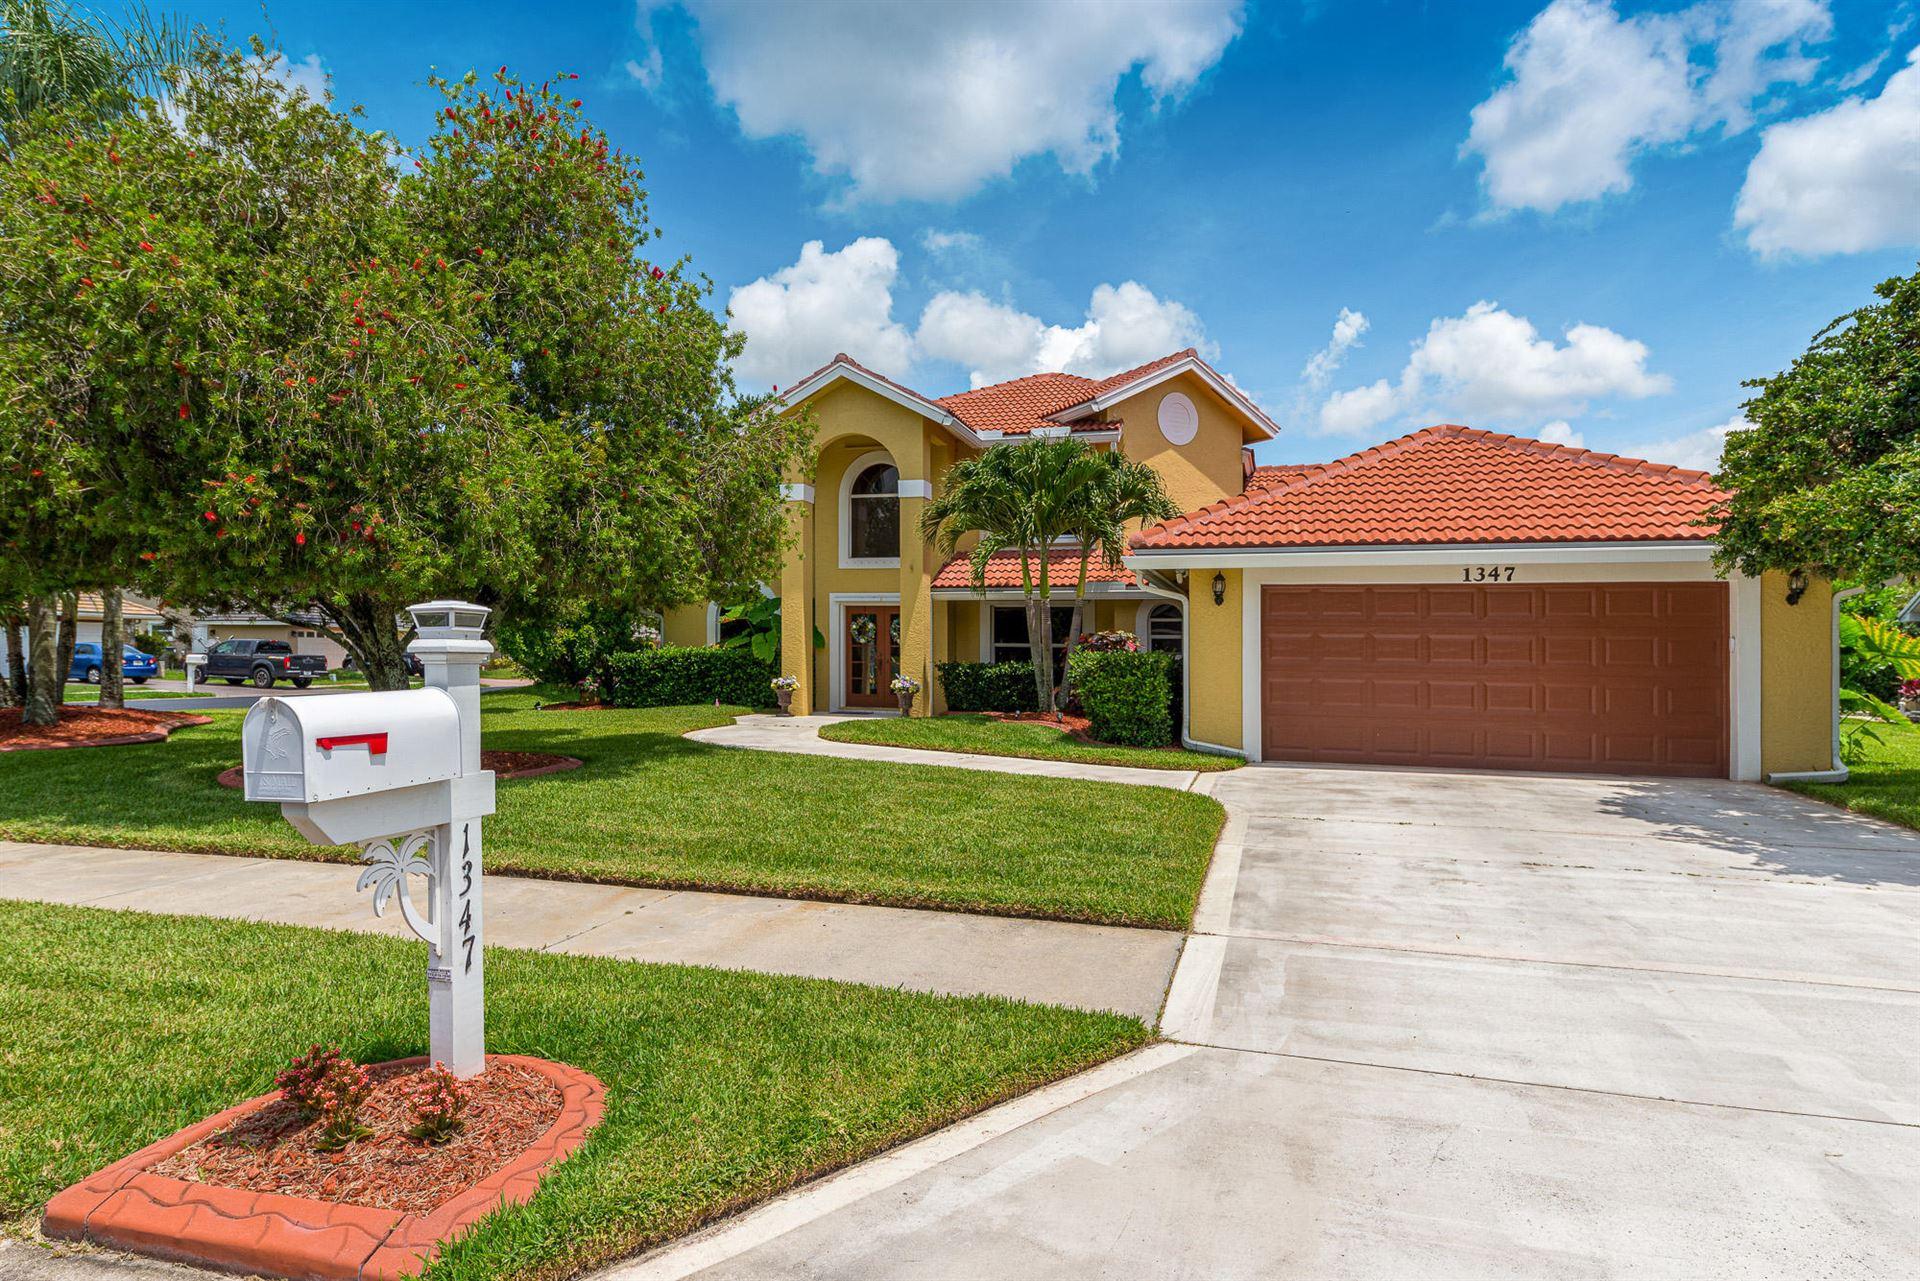 1347 SW Maplewood Drive, Port Saint Lucie, FL 34986 - MLS#: RX-10723526